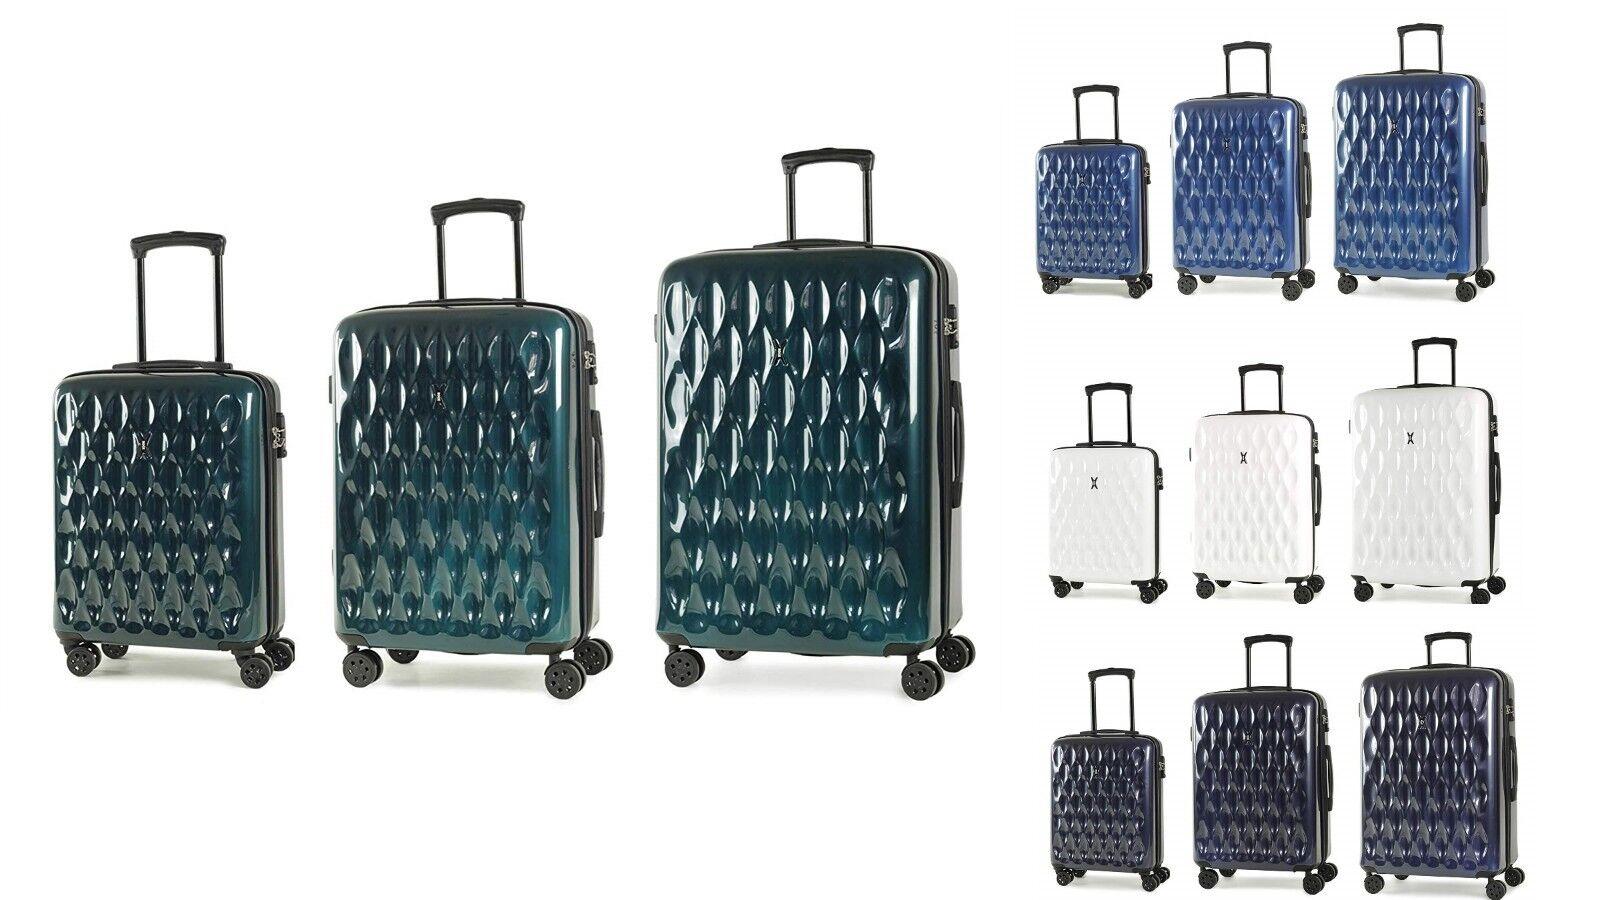 Rock Diamond Hardshell 8 Wheel Luggage Spinner Cases